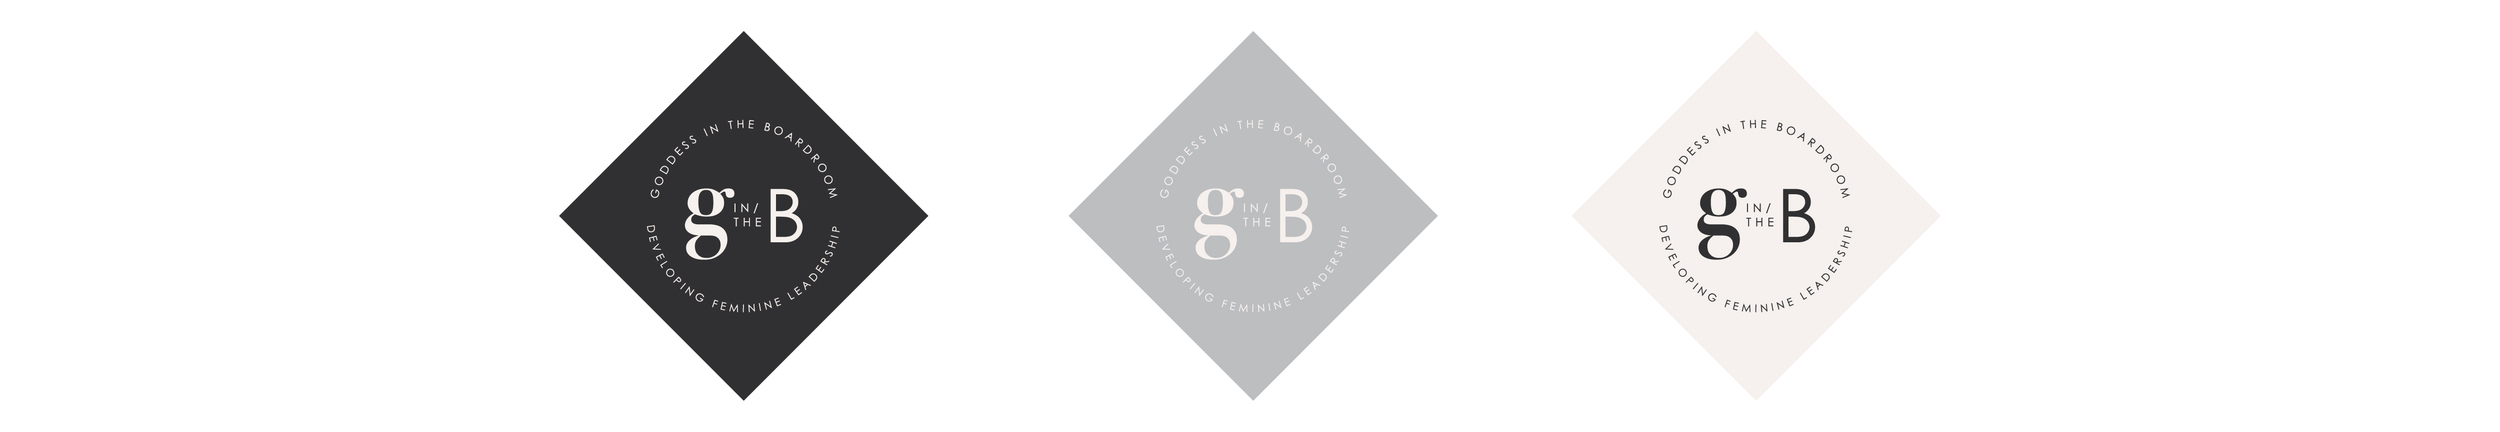 icons-GIB